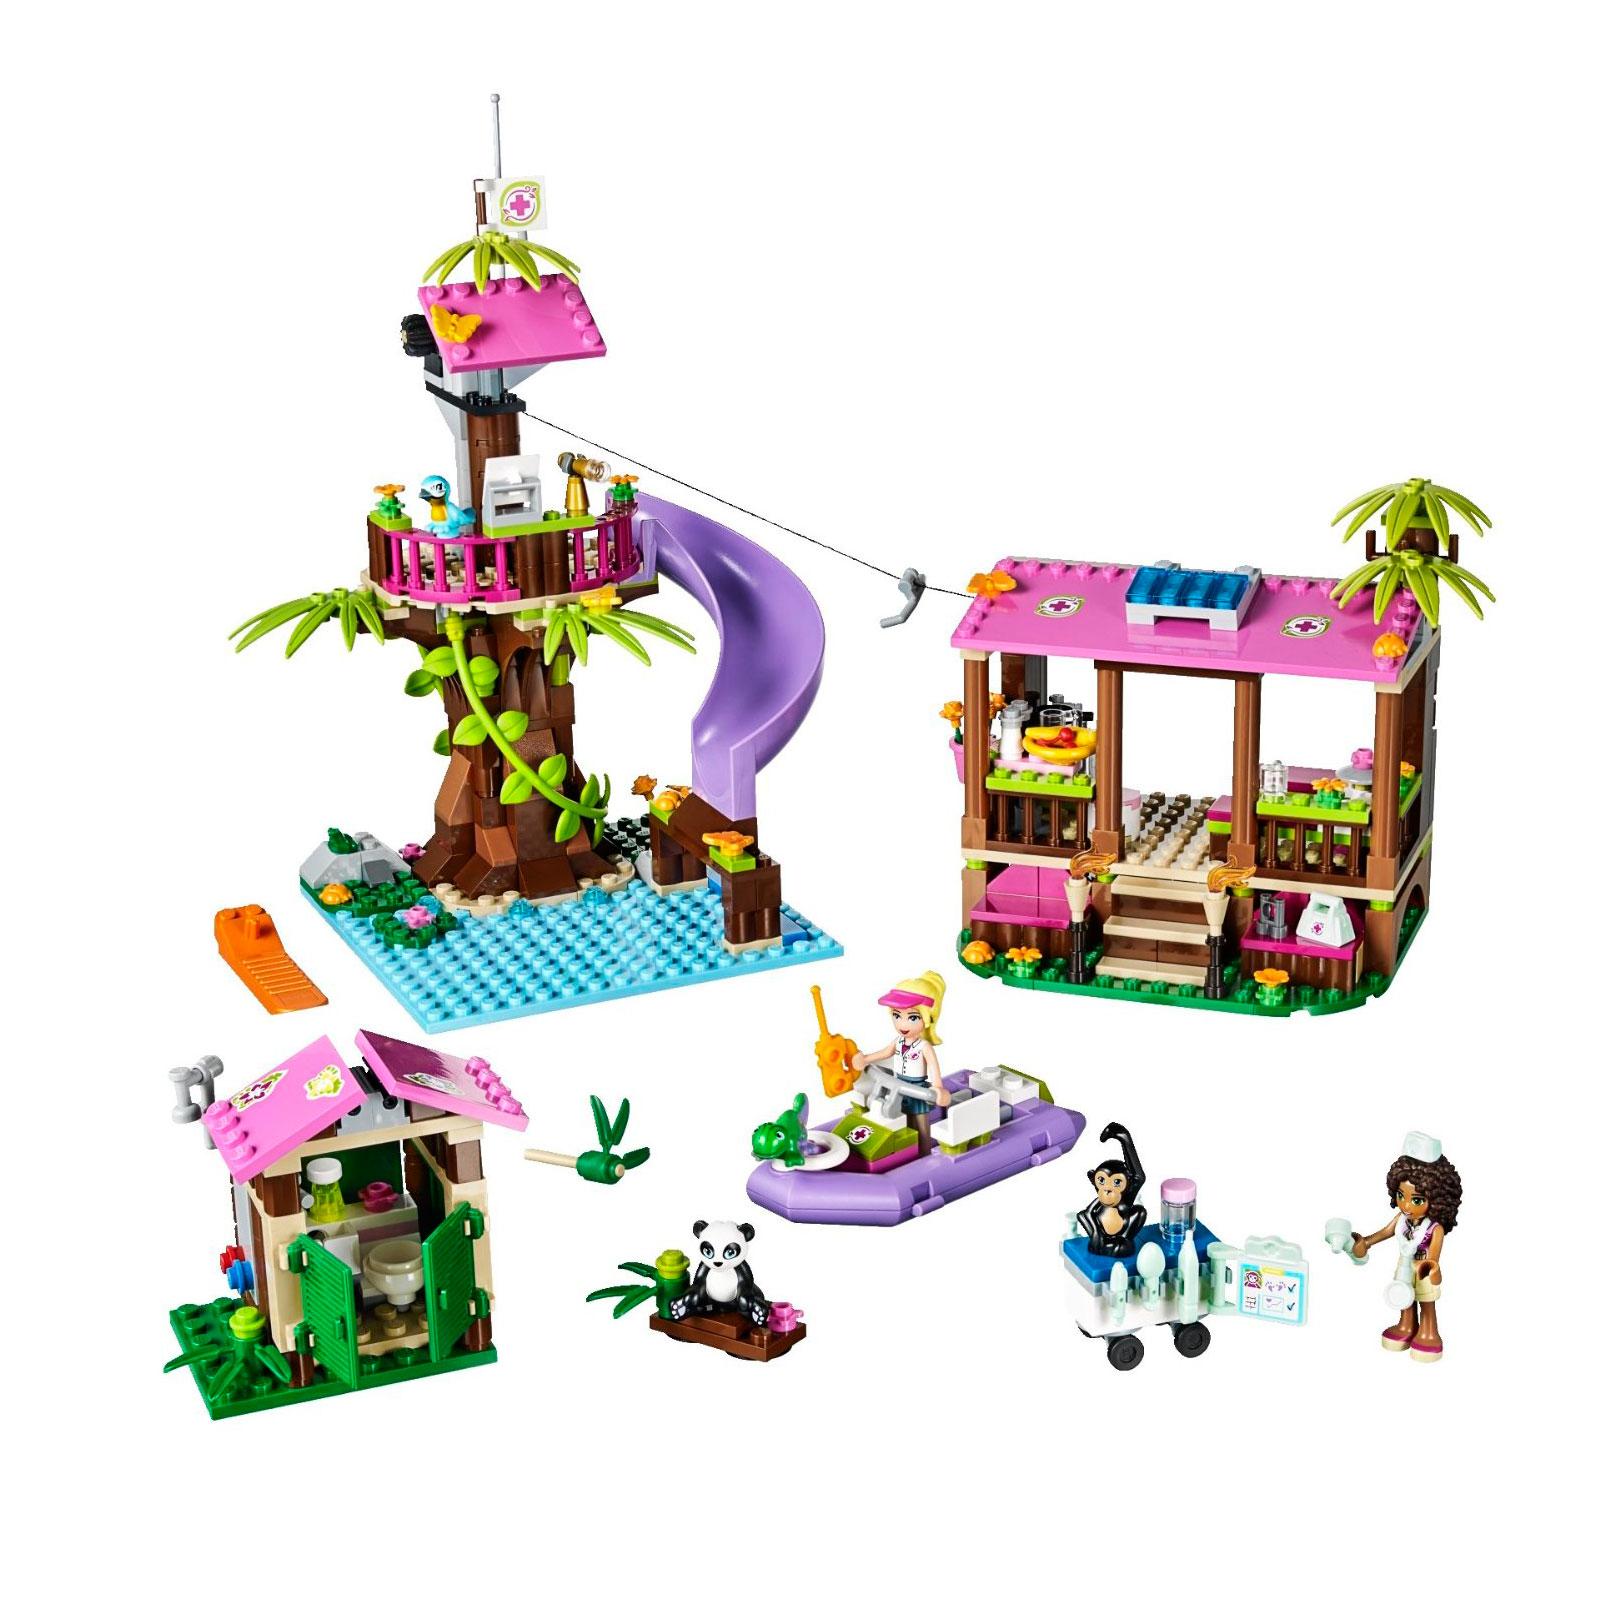 Конструктор LEGO Friends 41038 Джунгли: Штаб спасателей<br>